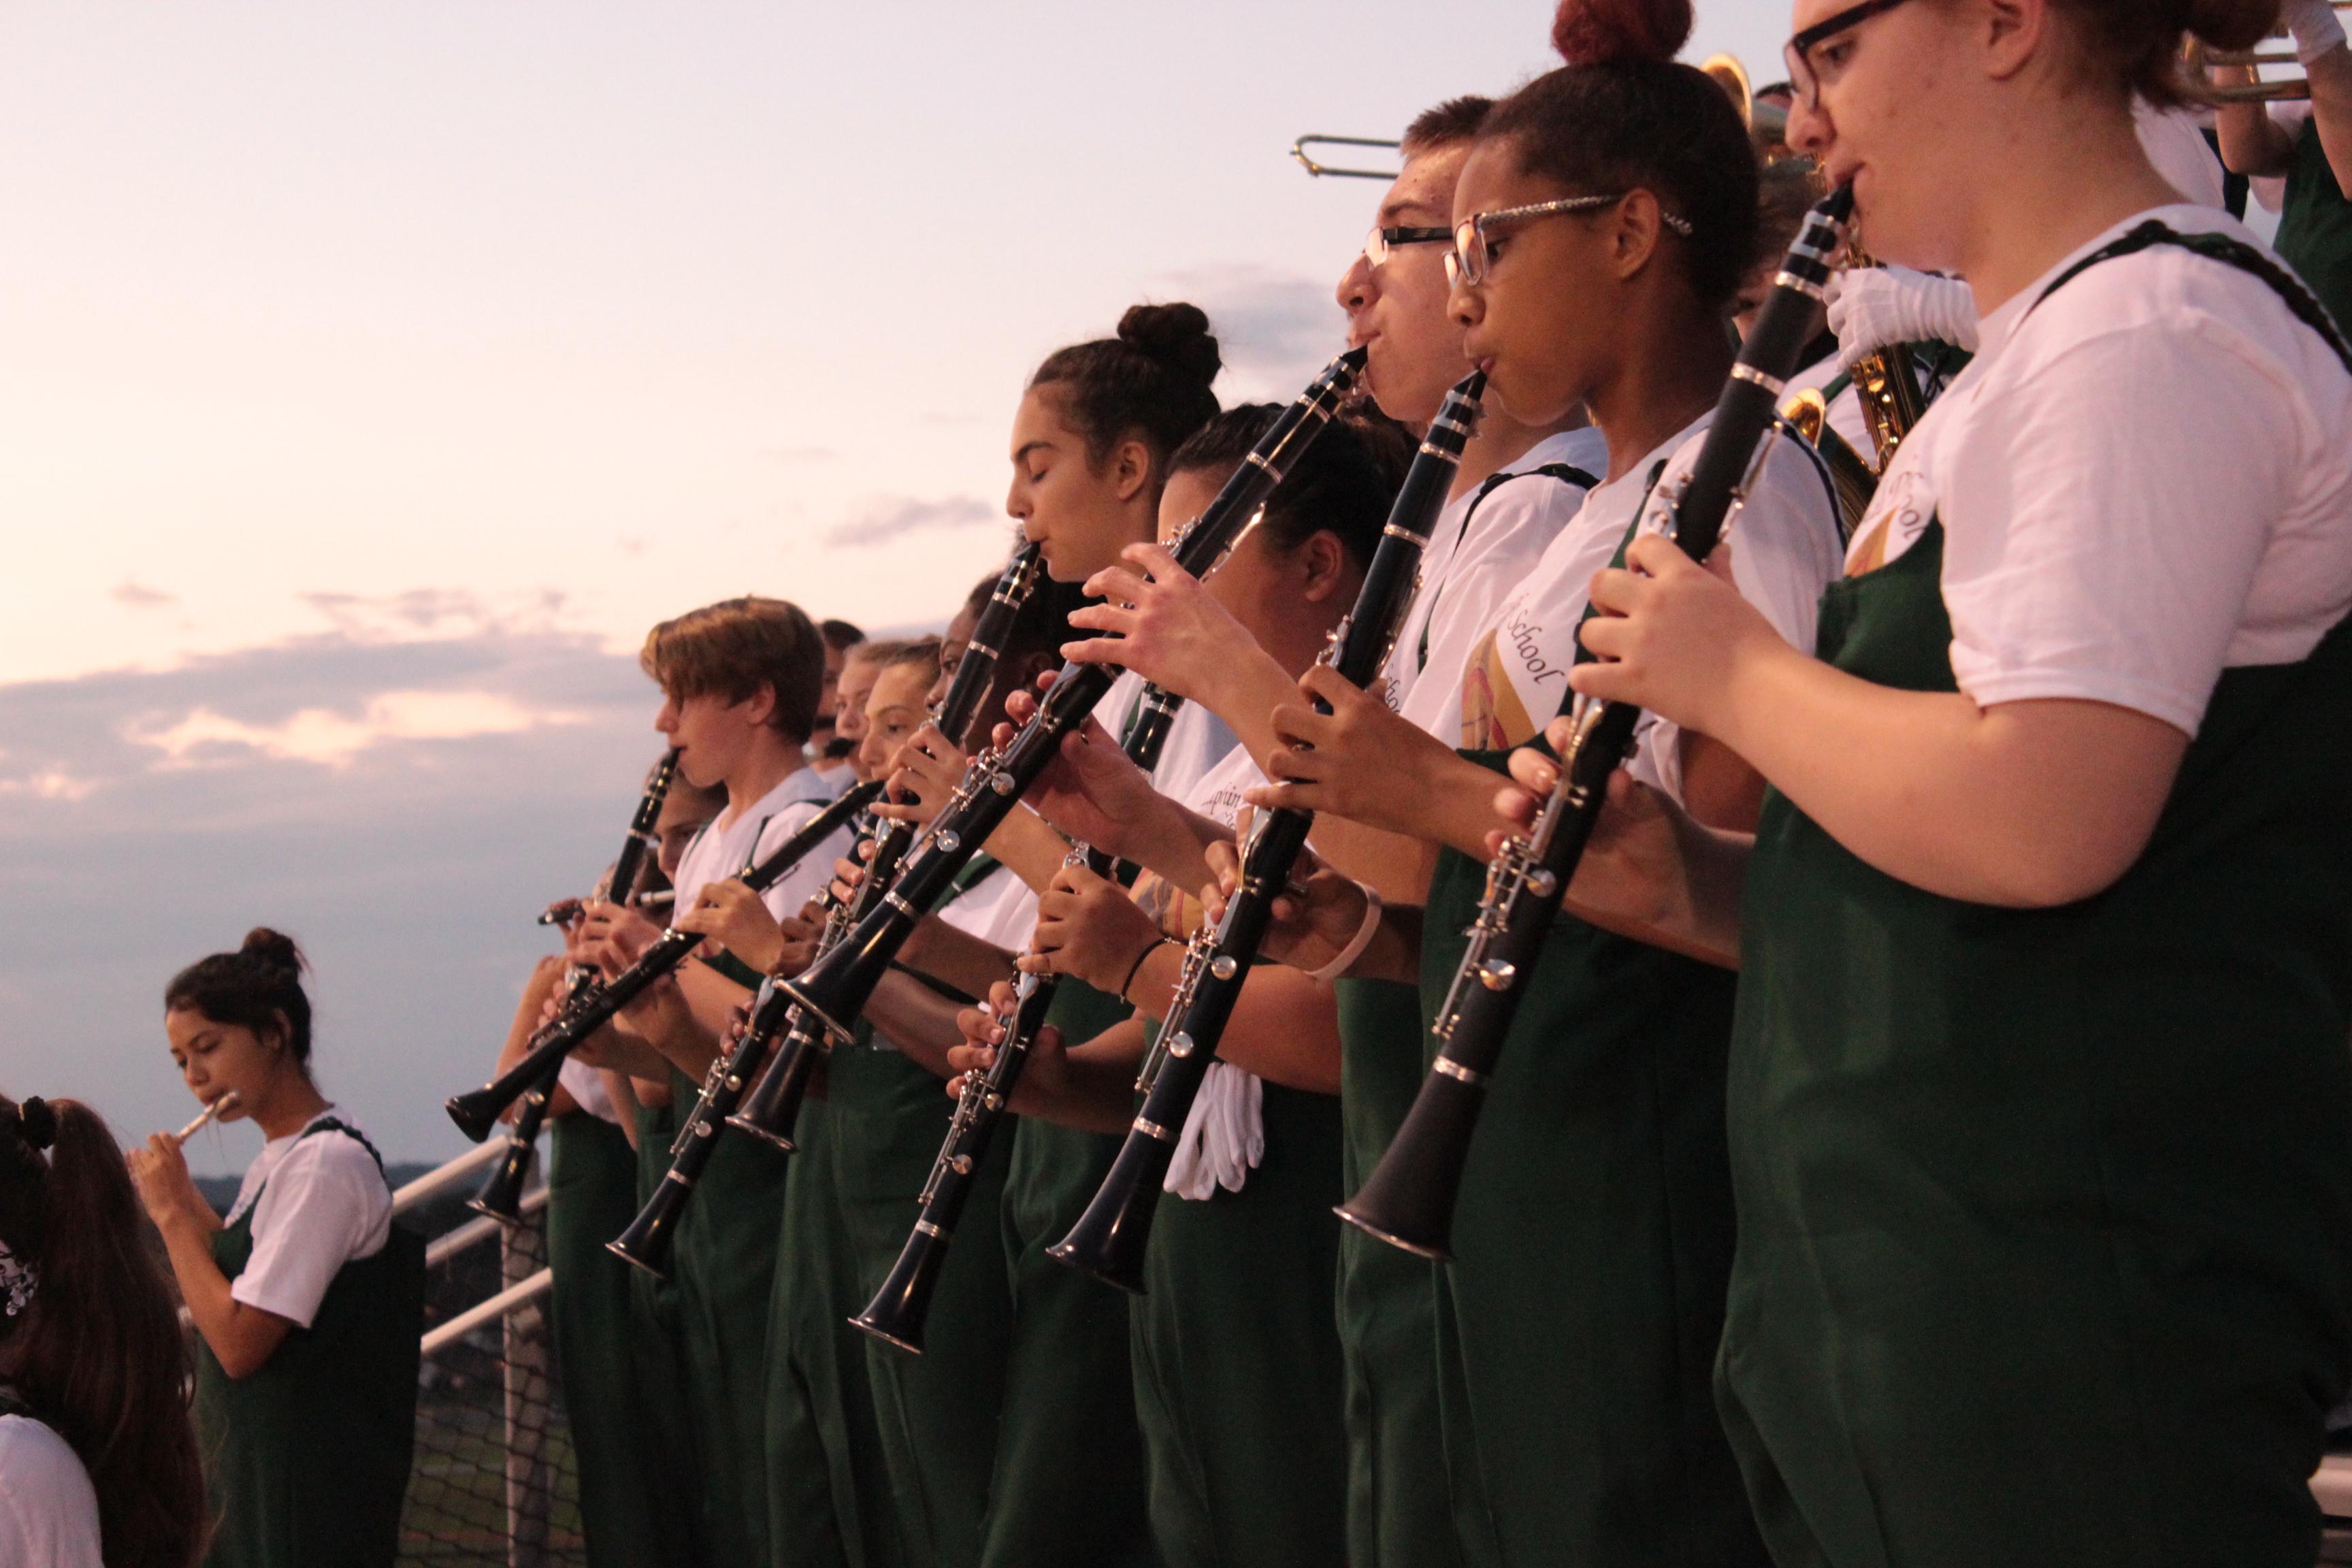 Clarinets rocking game night!